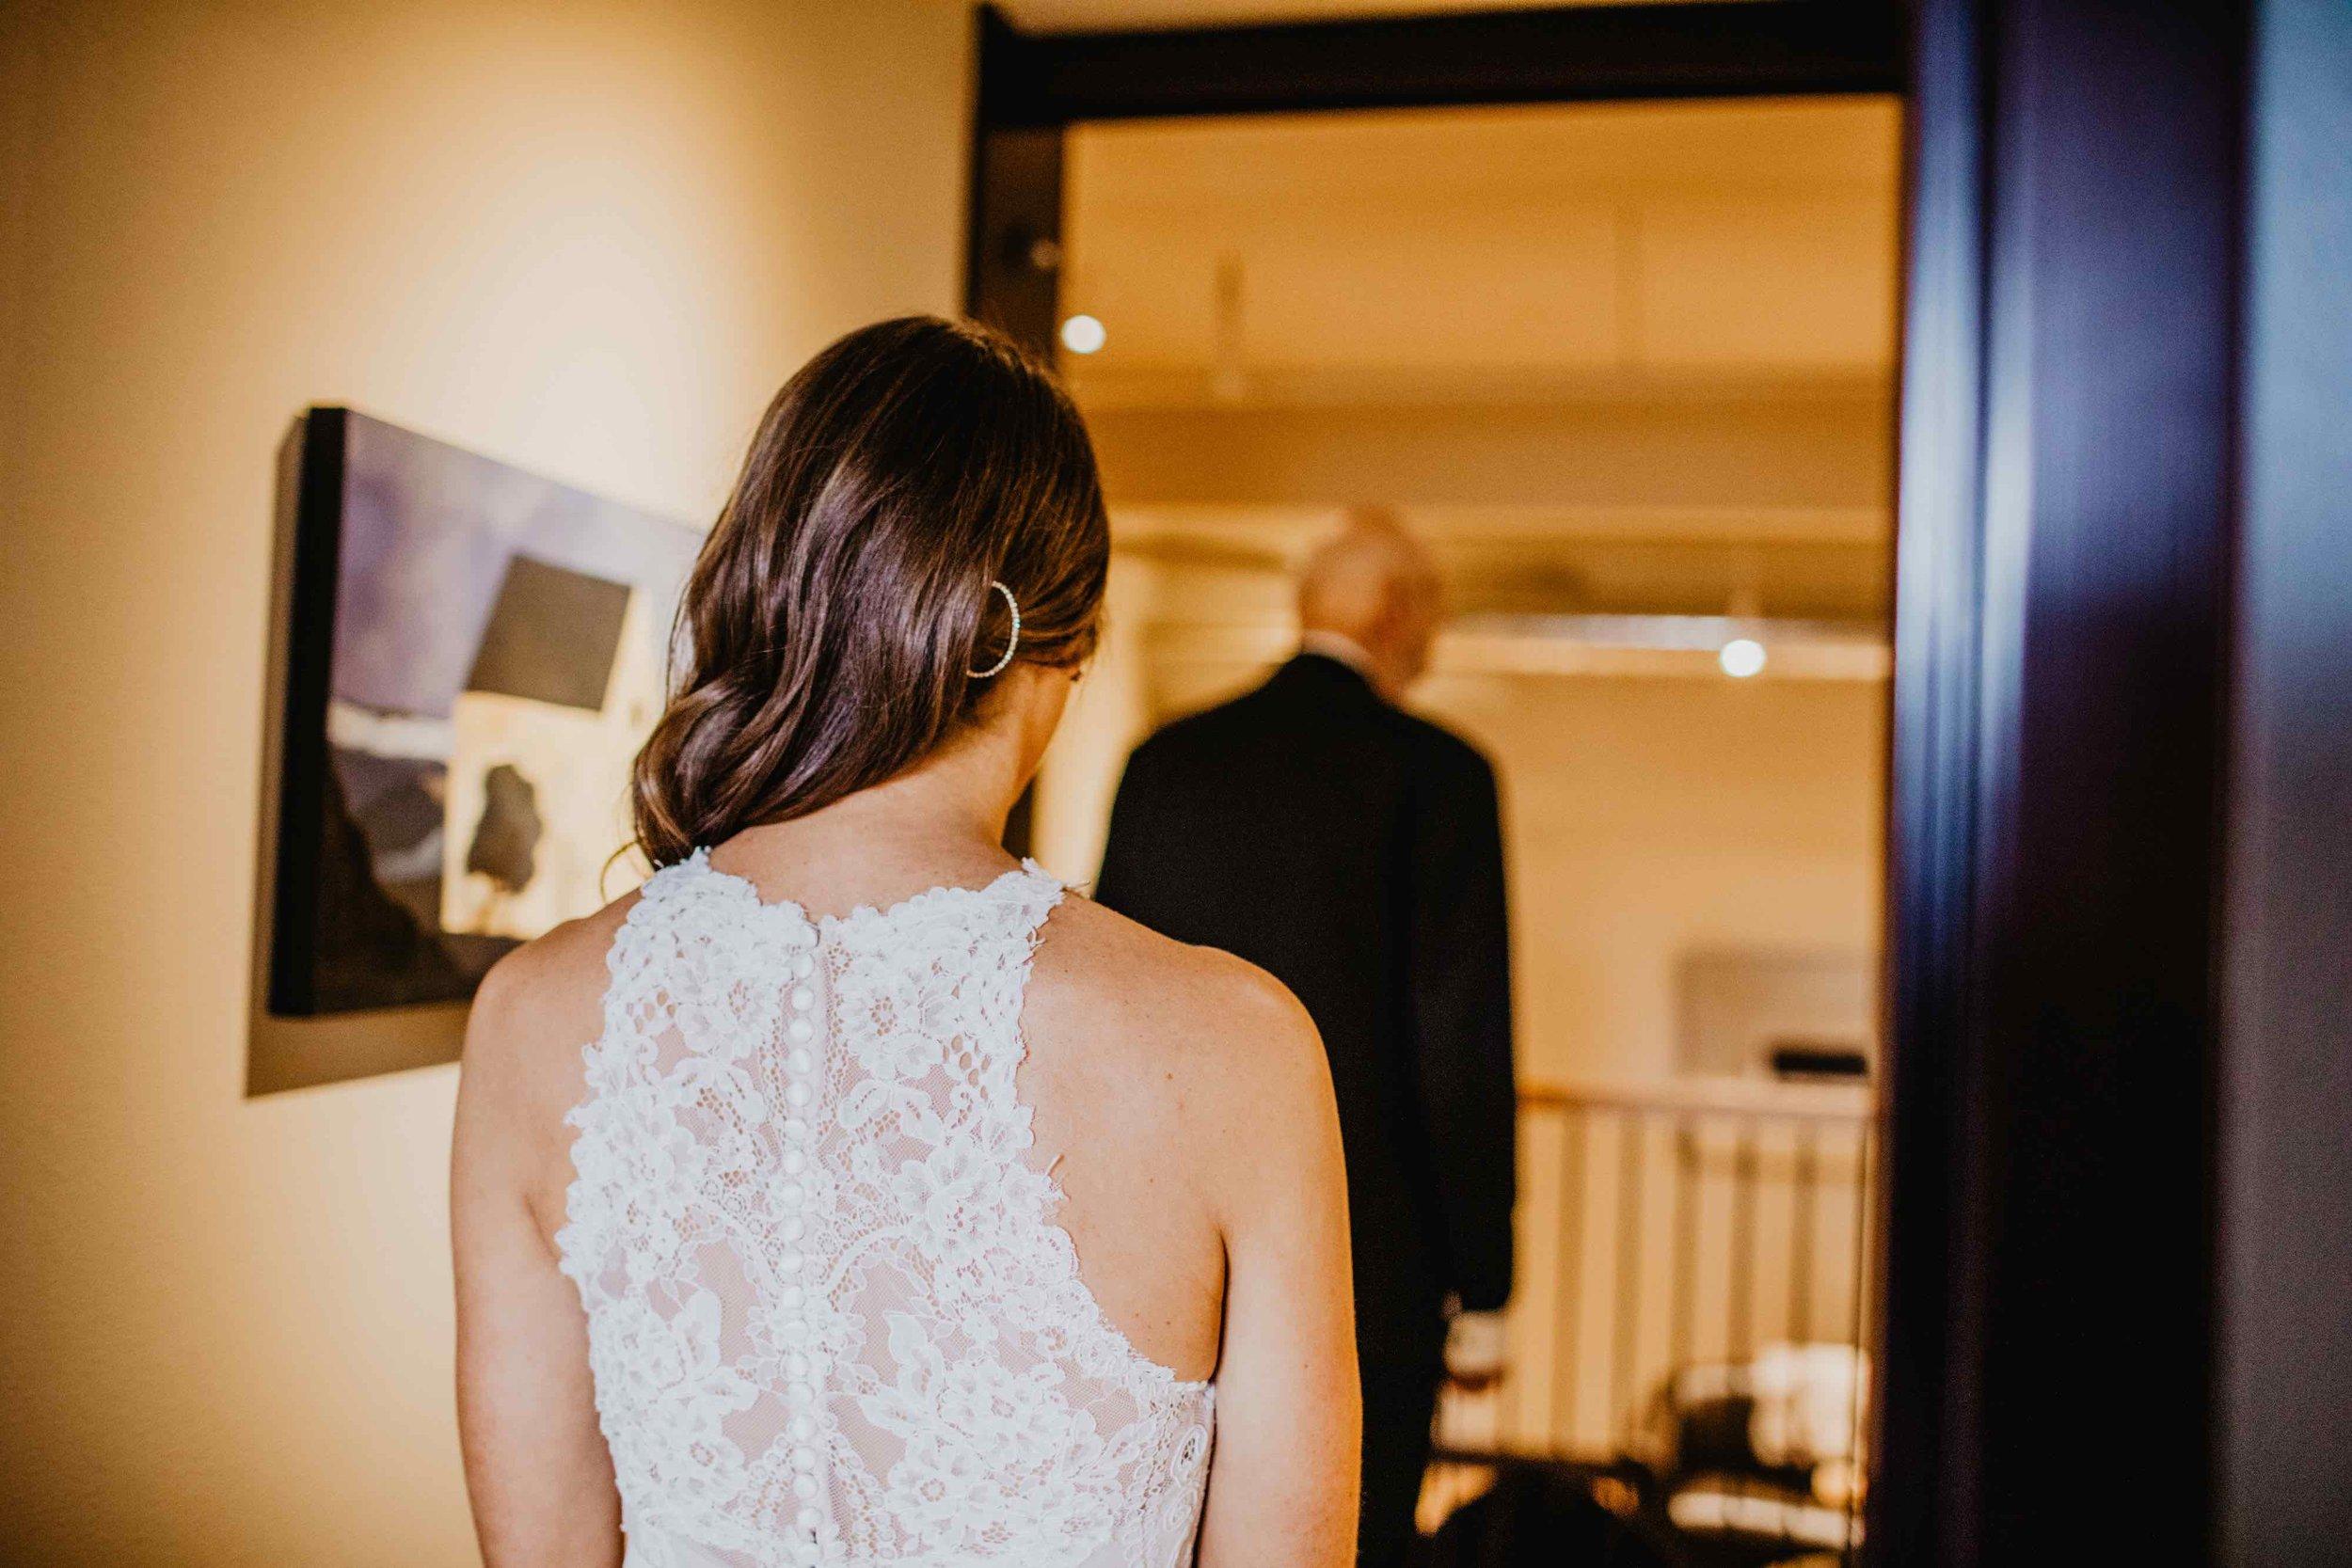 Kisa Conrad Favorites-0016-colorado-wedding-photographer-denver-springs-vailhotel-glenwood-springs-colorado-wedding-photographer.jpeg